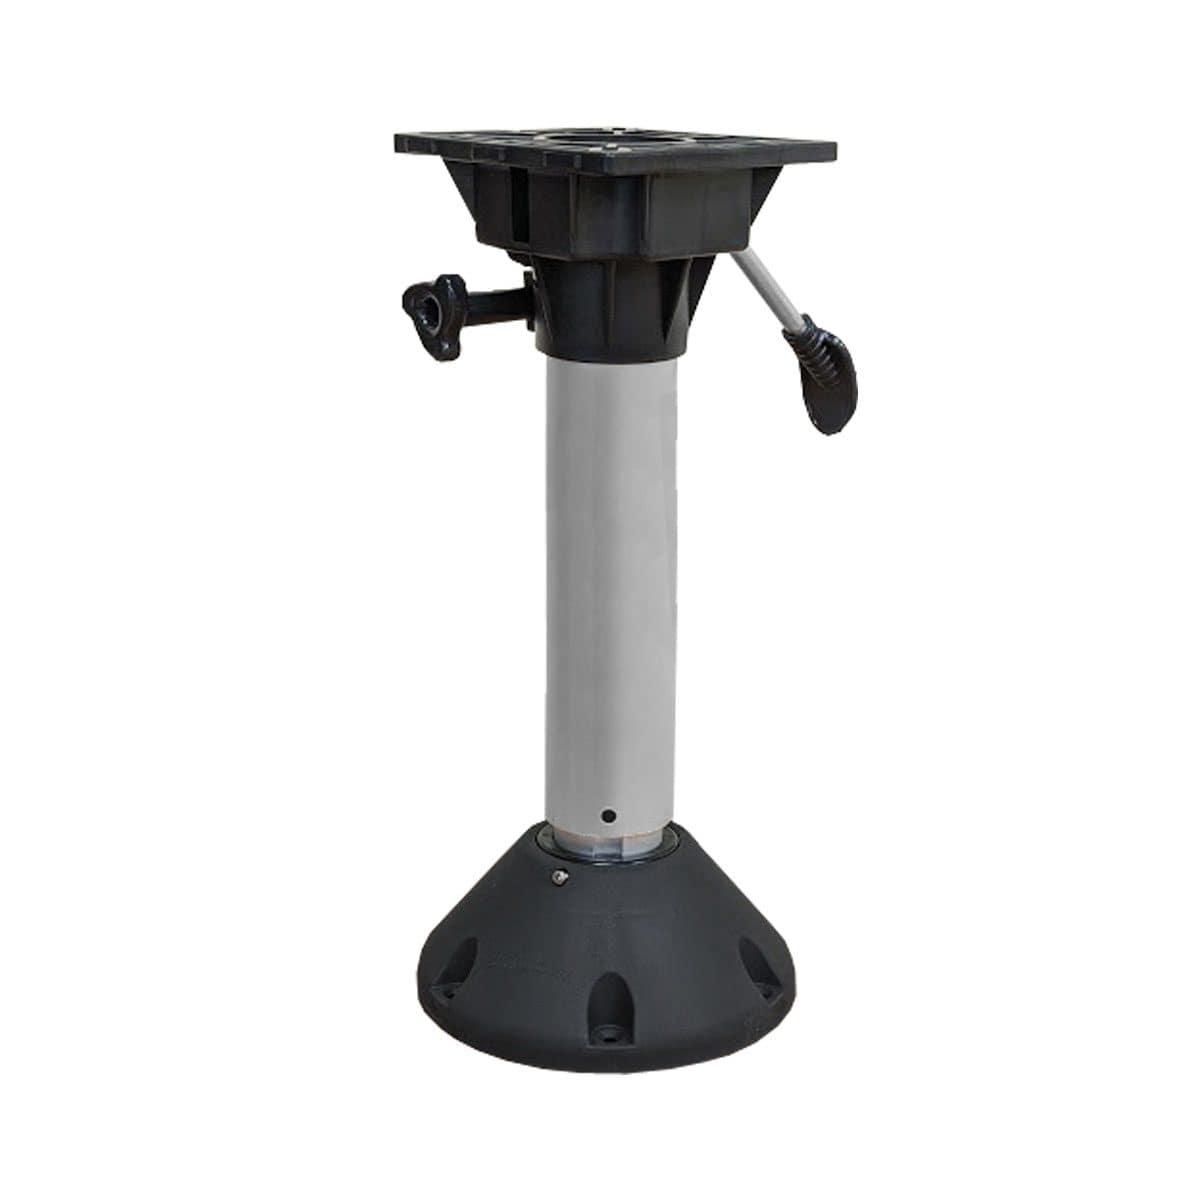 Oceansouth Adjustable Seat Pedestal